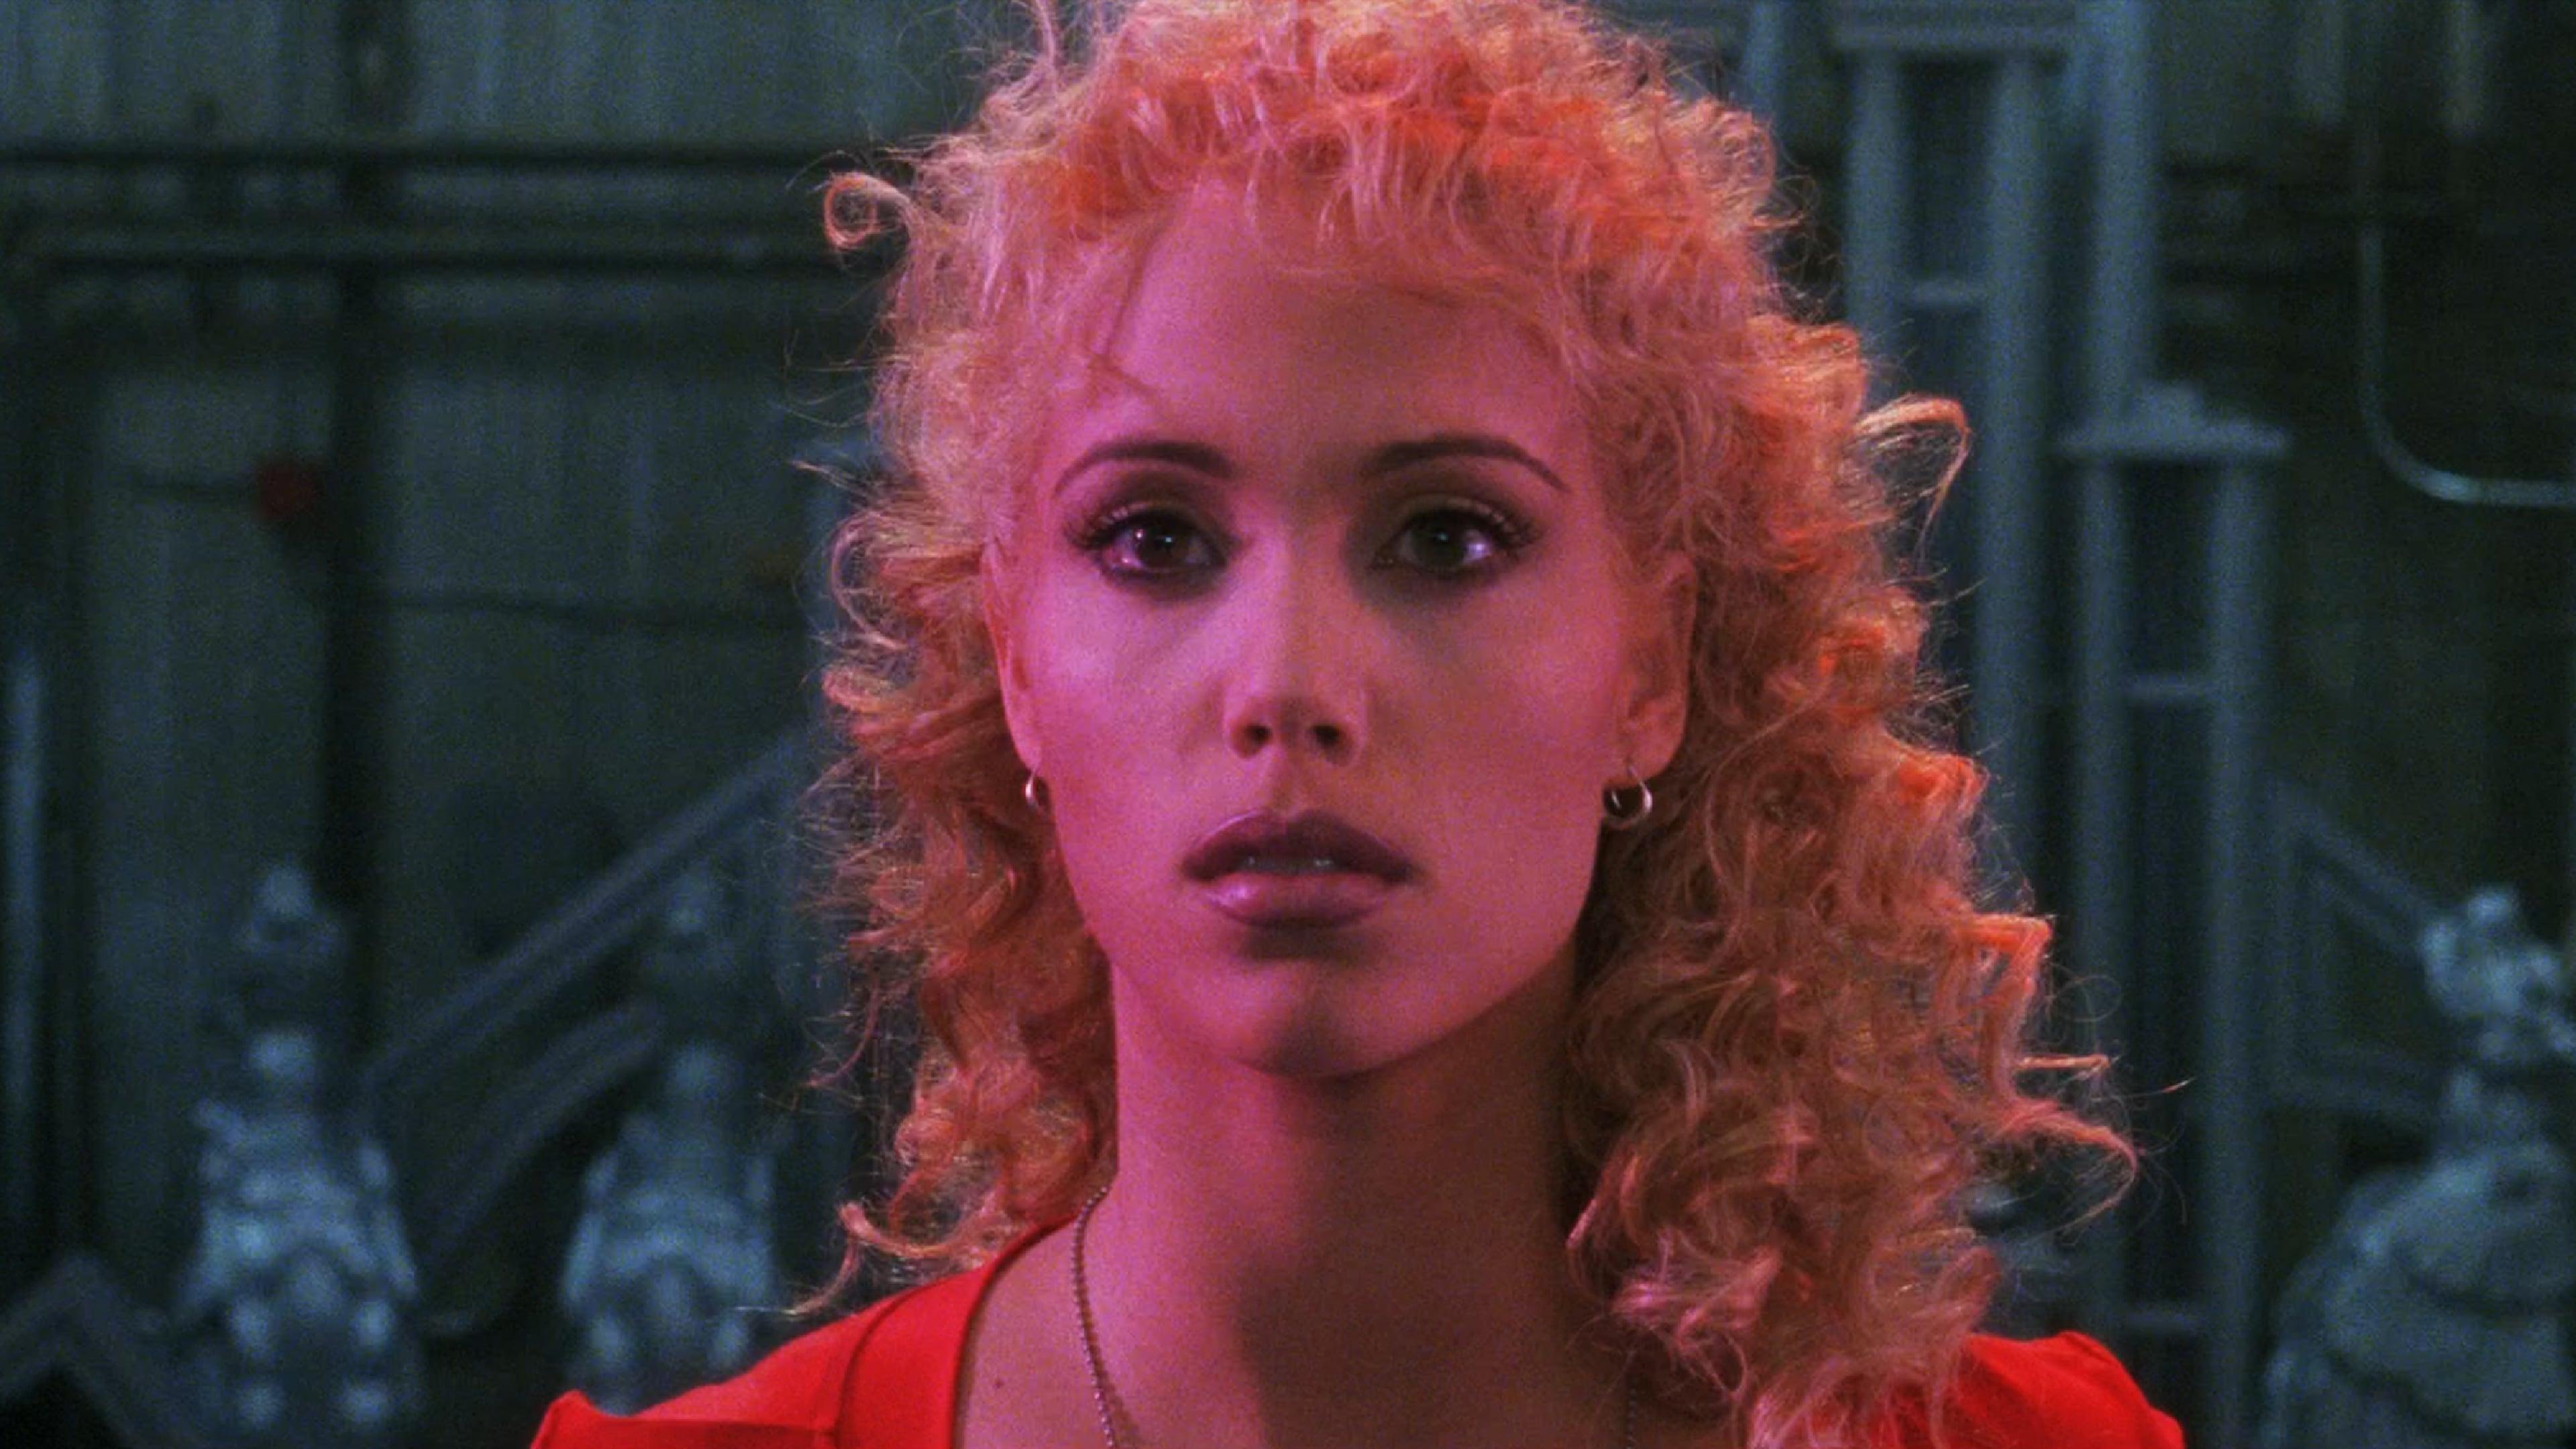 Showgirls (1995) 720p & 1080p Bluray Free Donwload - Filmxy